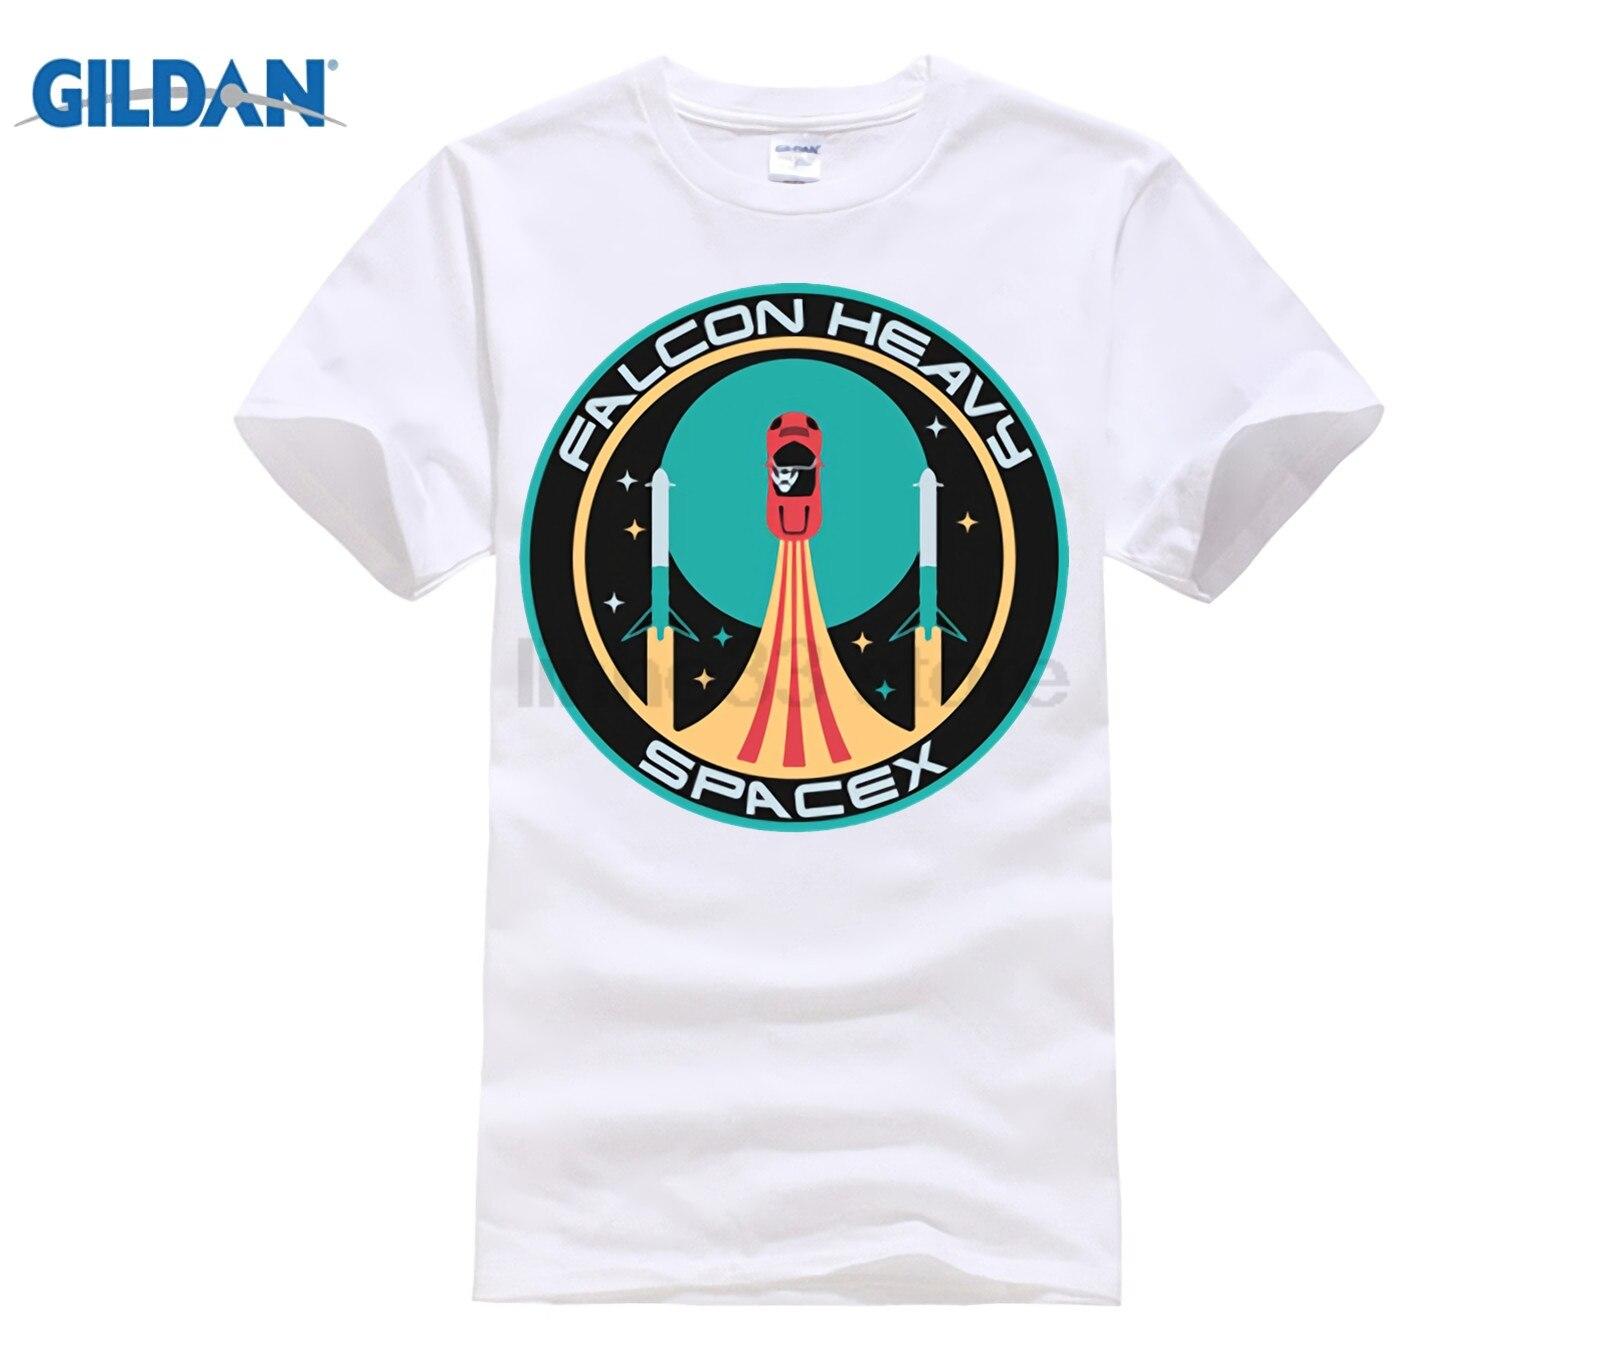 e031638dc SpaceX T-shirt Elon Musk heavy T shirts men Mars starman car Tee shirt  rocket tshirt StarmanX T shirt Tesla Roadster Tees